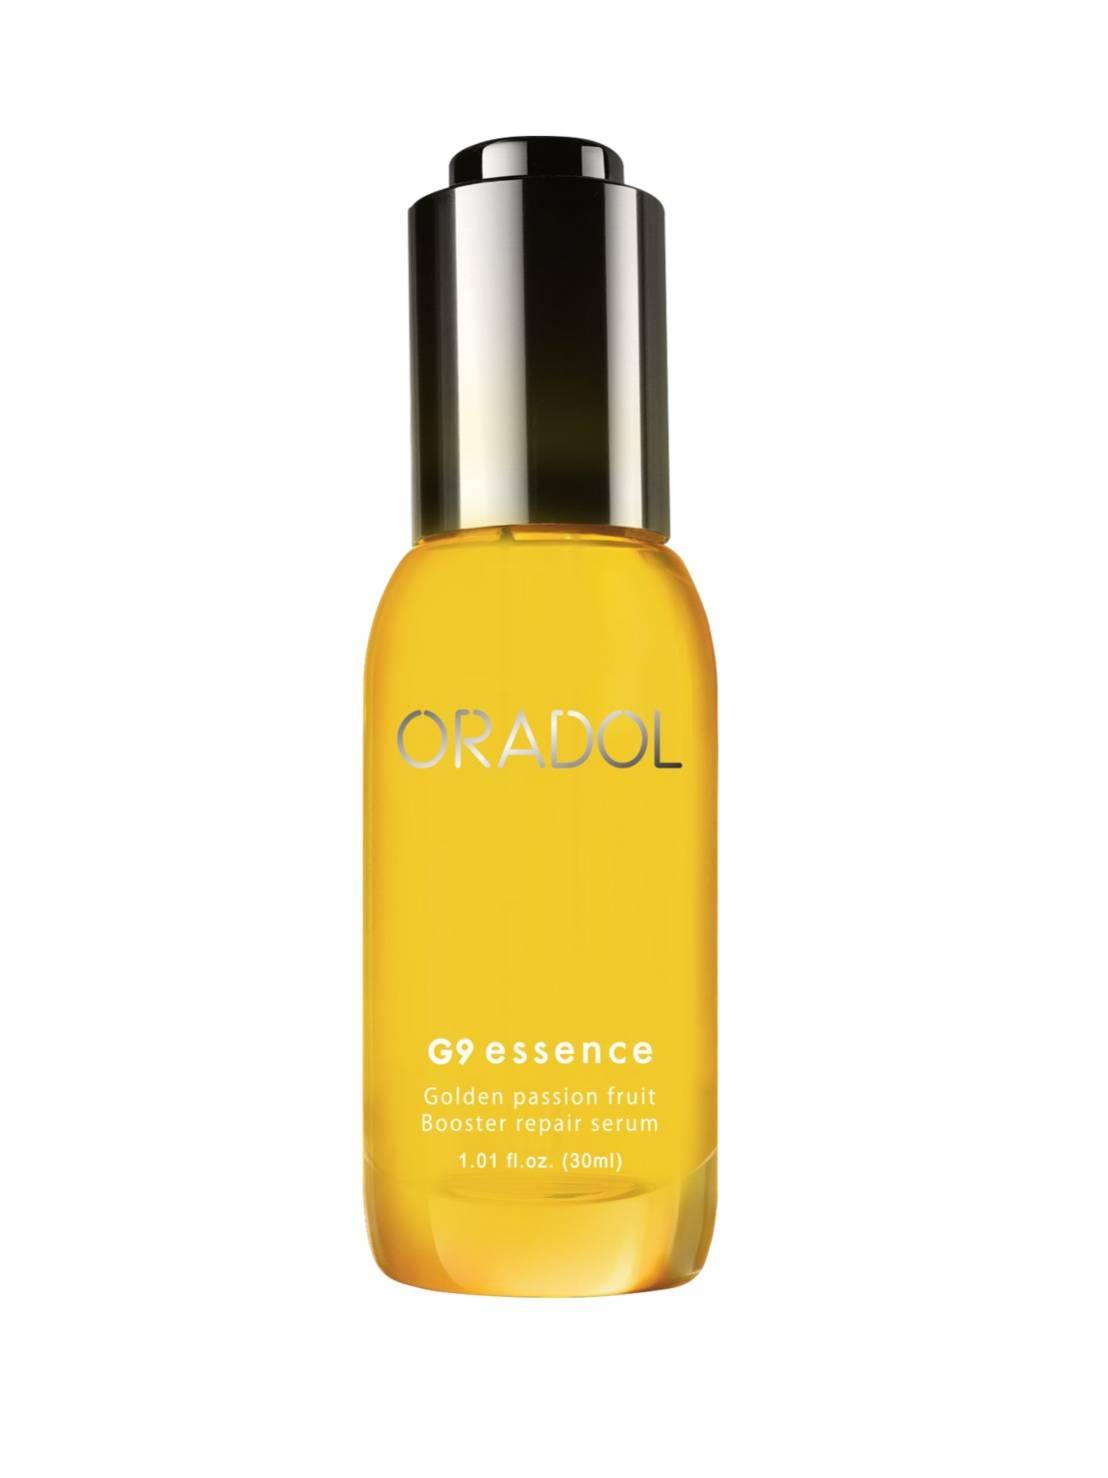 Oradol serum 10 ml ออราดอลซีรั่ม Booster repair serum1 ขวด